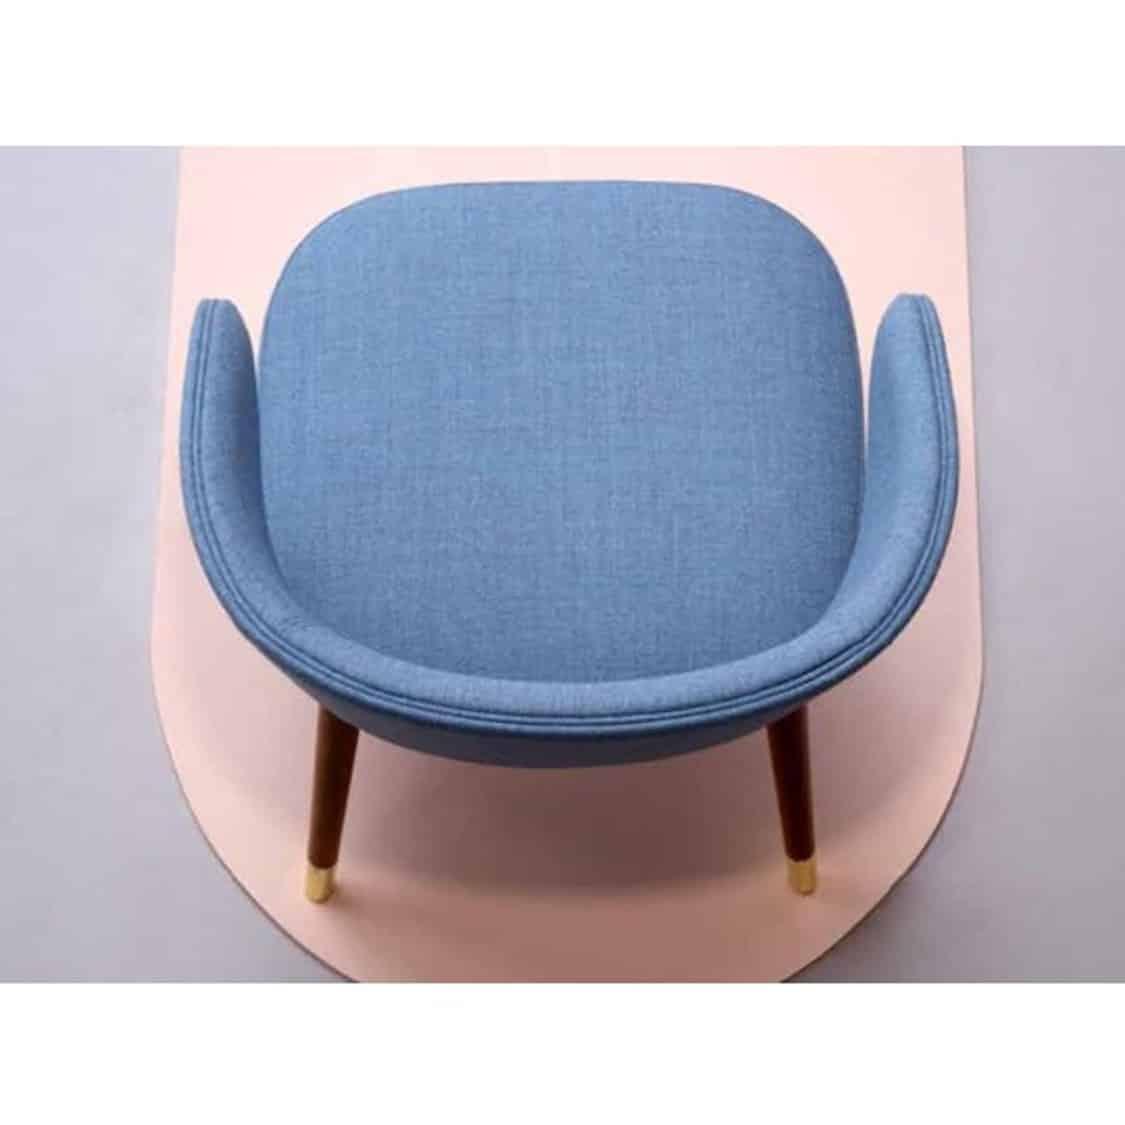 Abbraccio ariel view side chair Accento at DeFrae Contract Furniture